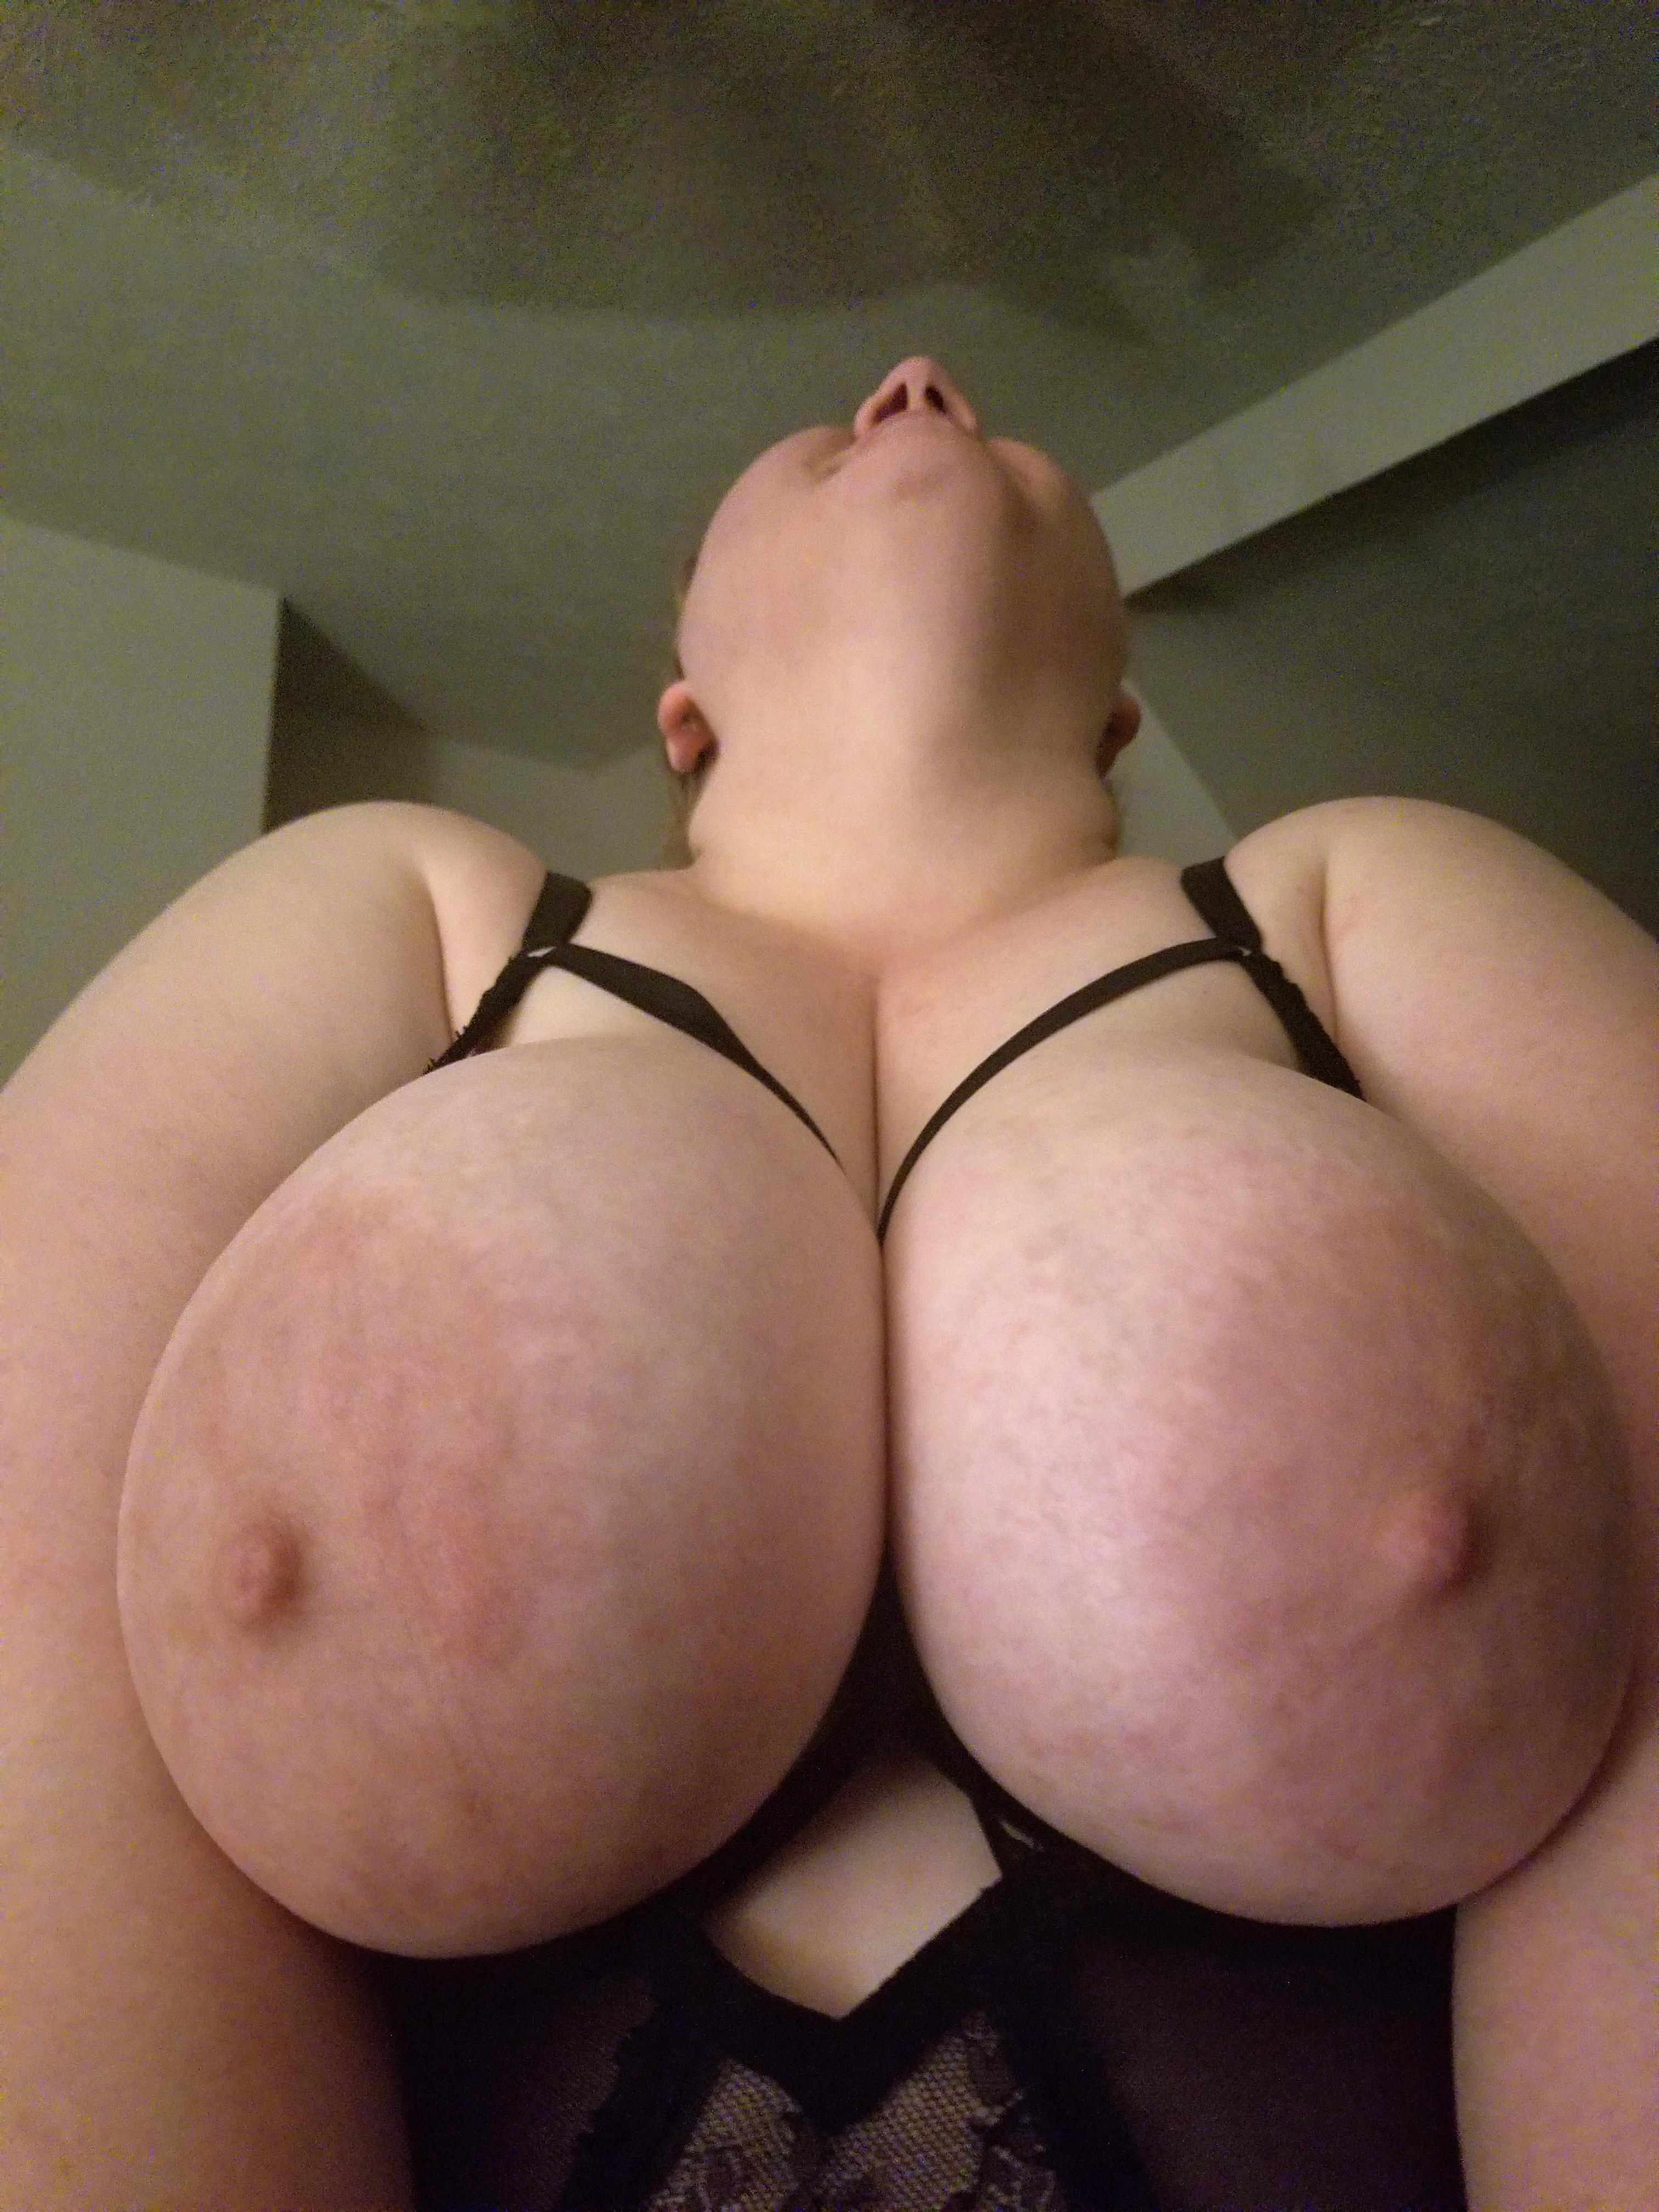 Naked women videos